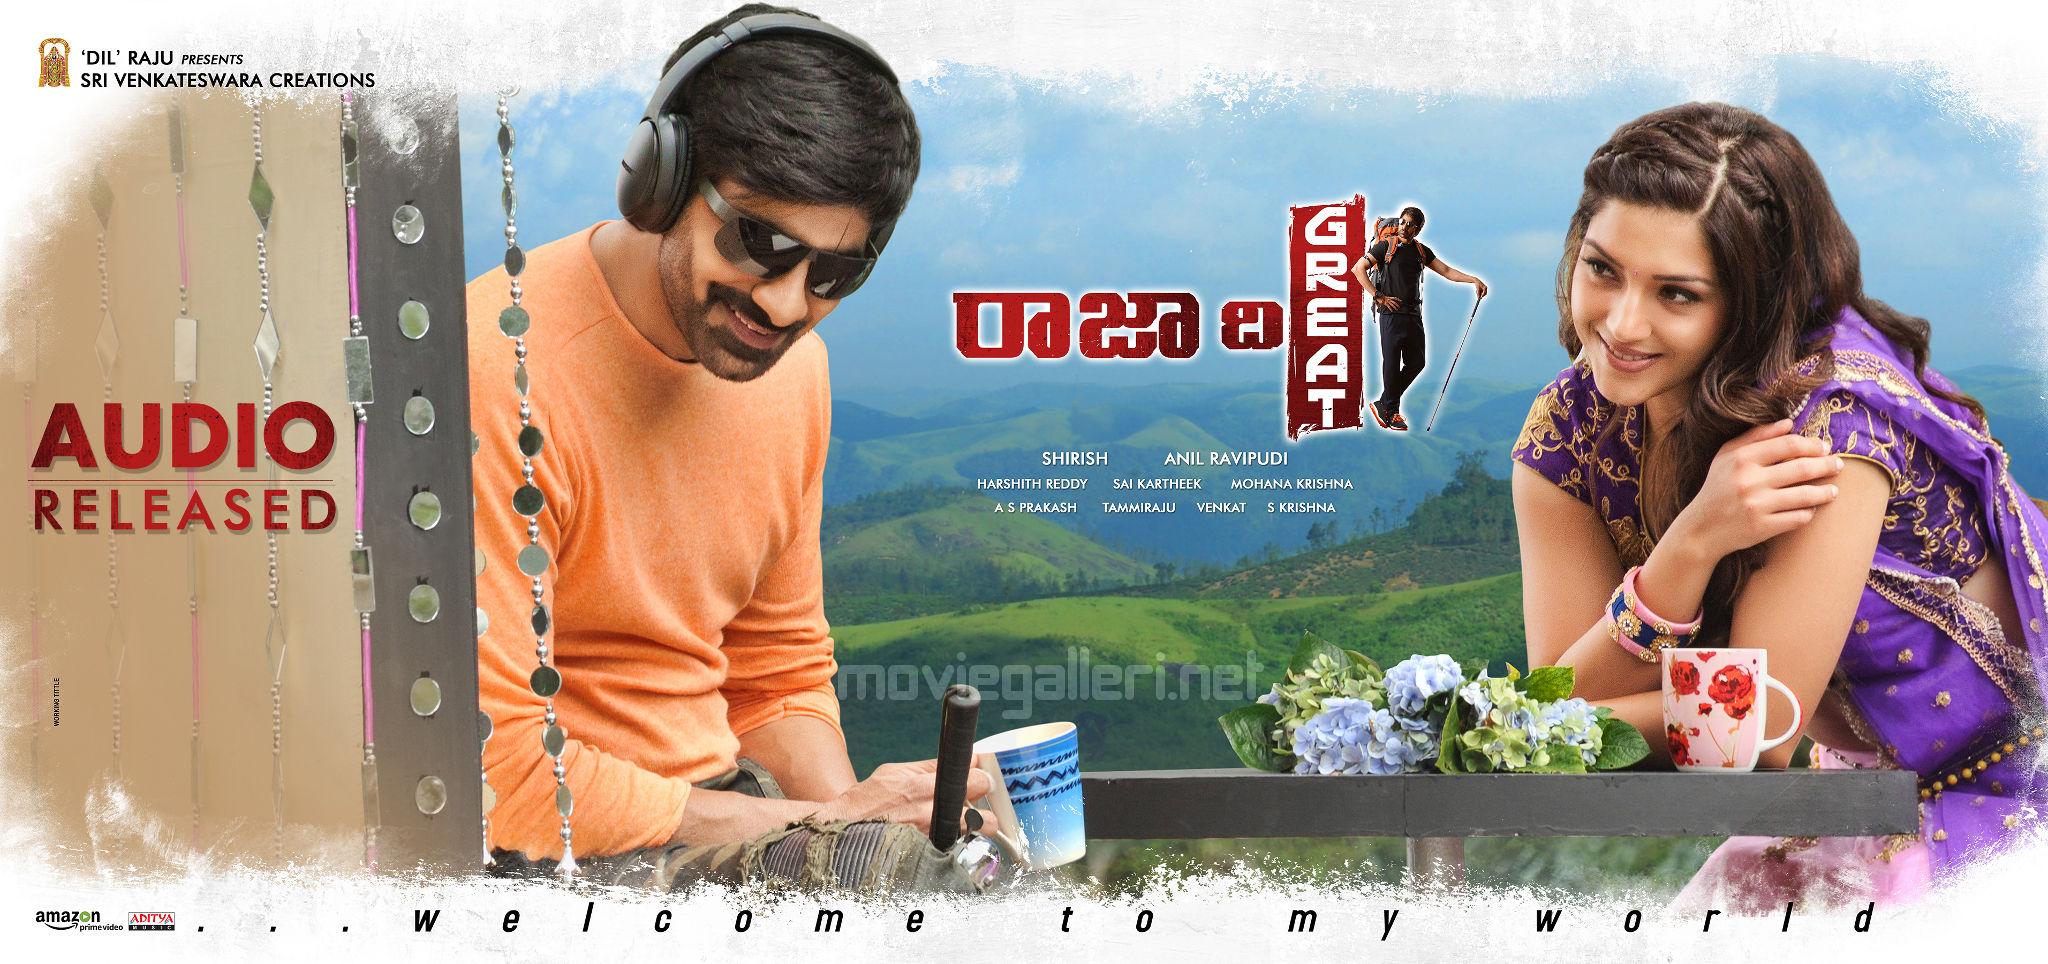 Ravi Teja Mehreen Pirzada Raja the Great Movie Audio Released Wallpapers